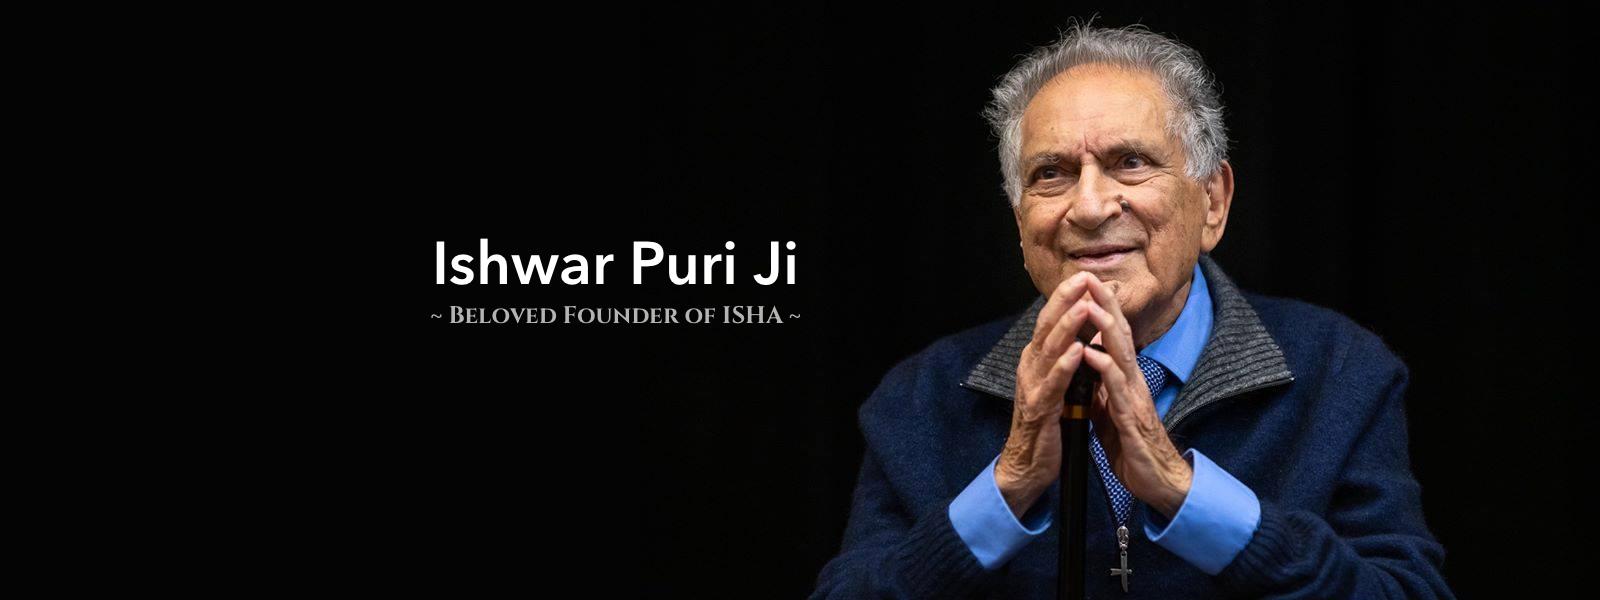 Ishwar C. Puri